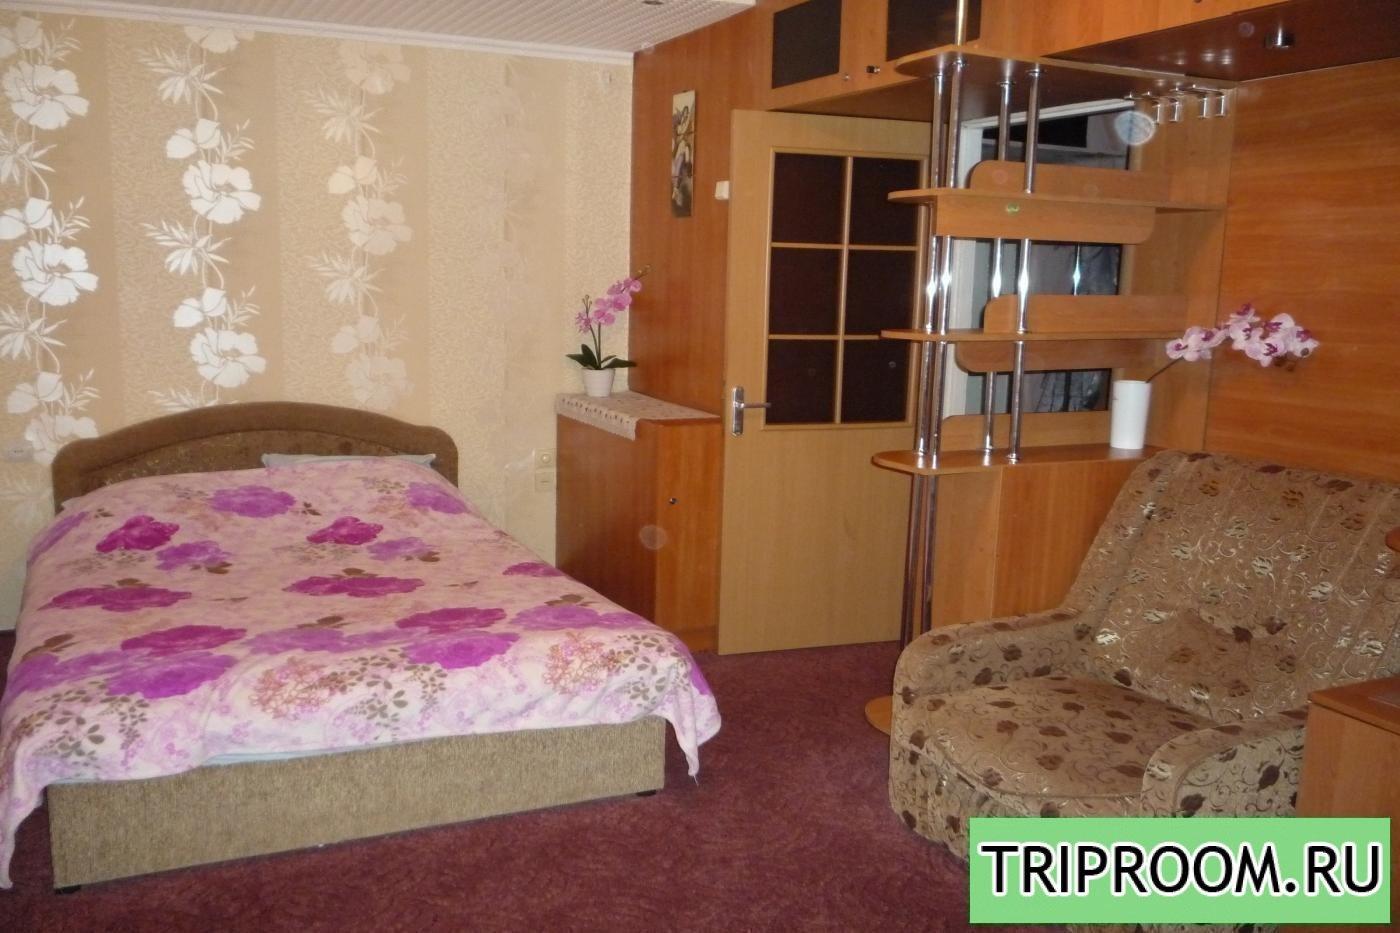 1-комнатная квартира посуточно (вариант № 13441), ул. Гагарина проспект, фото № 3